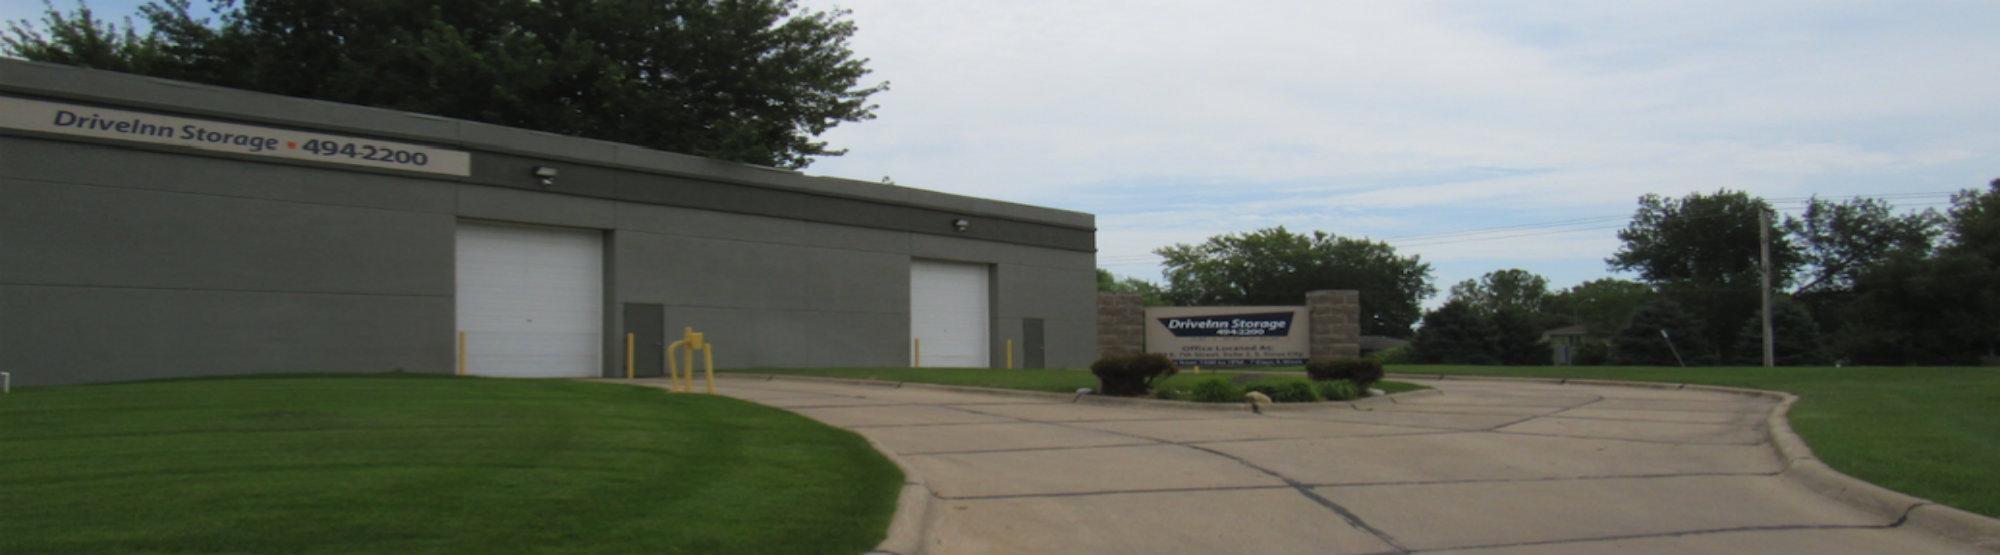 Drive Inn Storage South